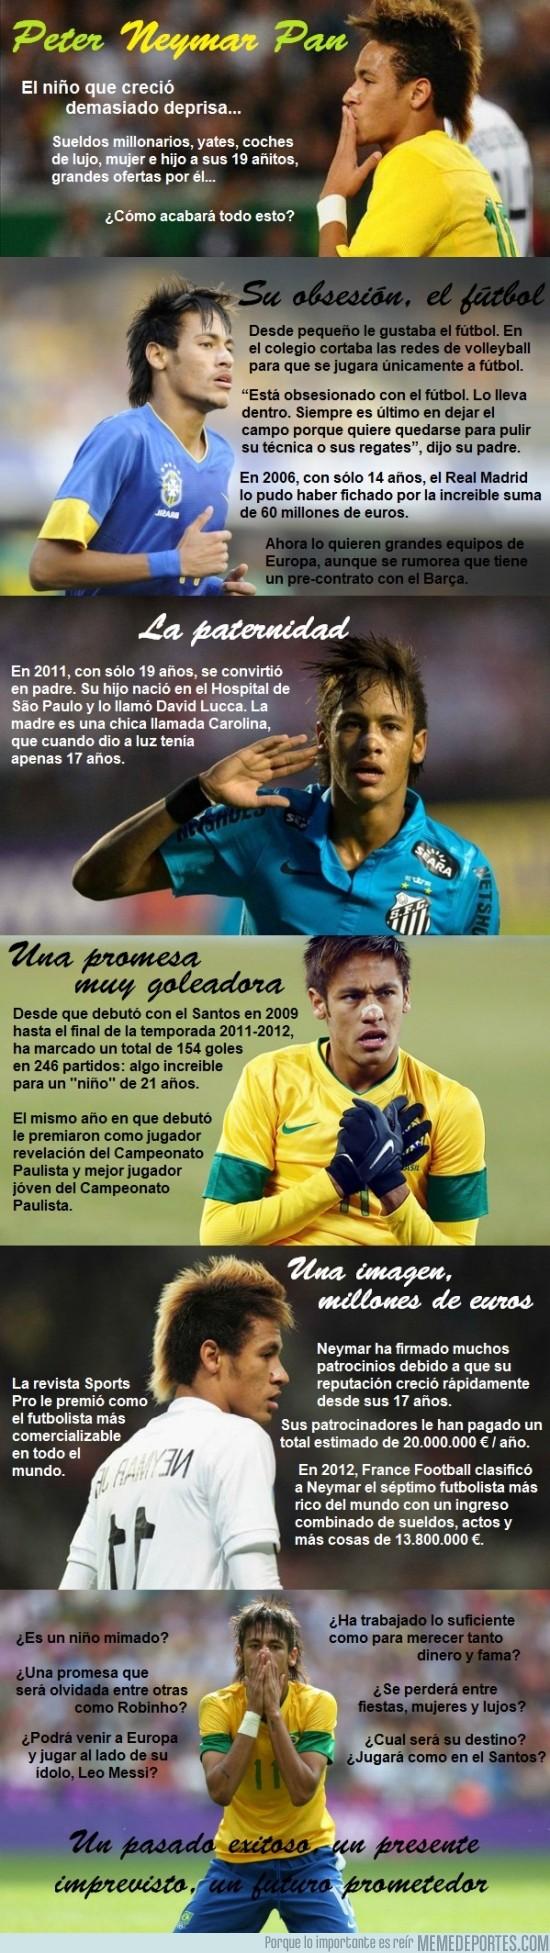 105272 - Neymar Jr. la gran promesa del fútbol actual